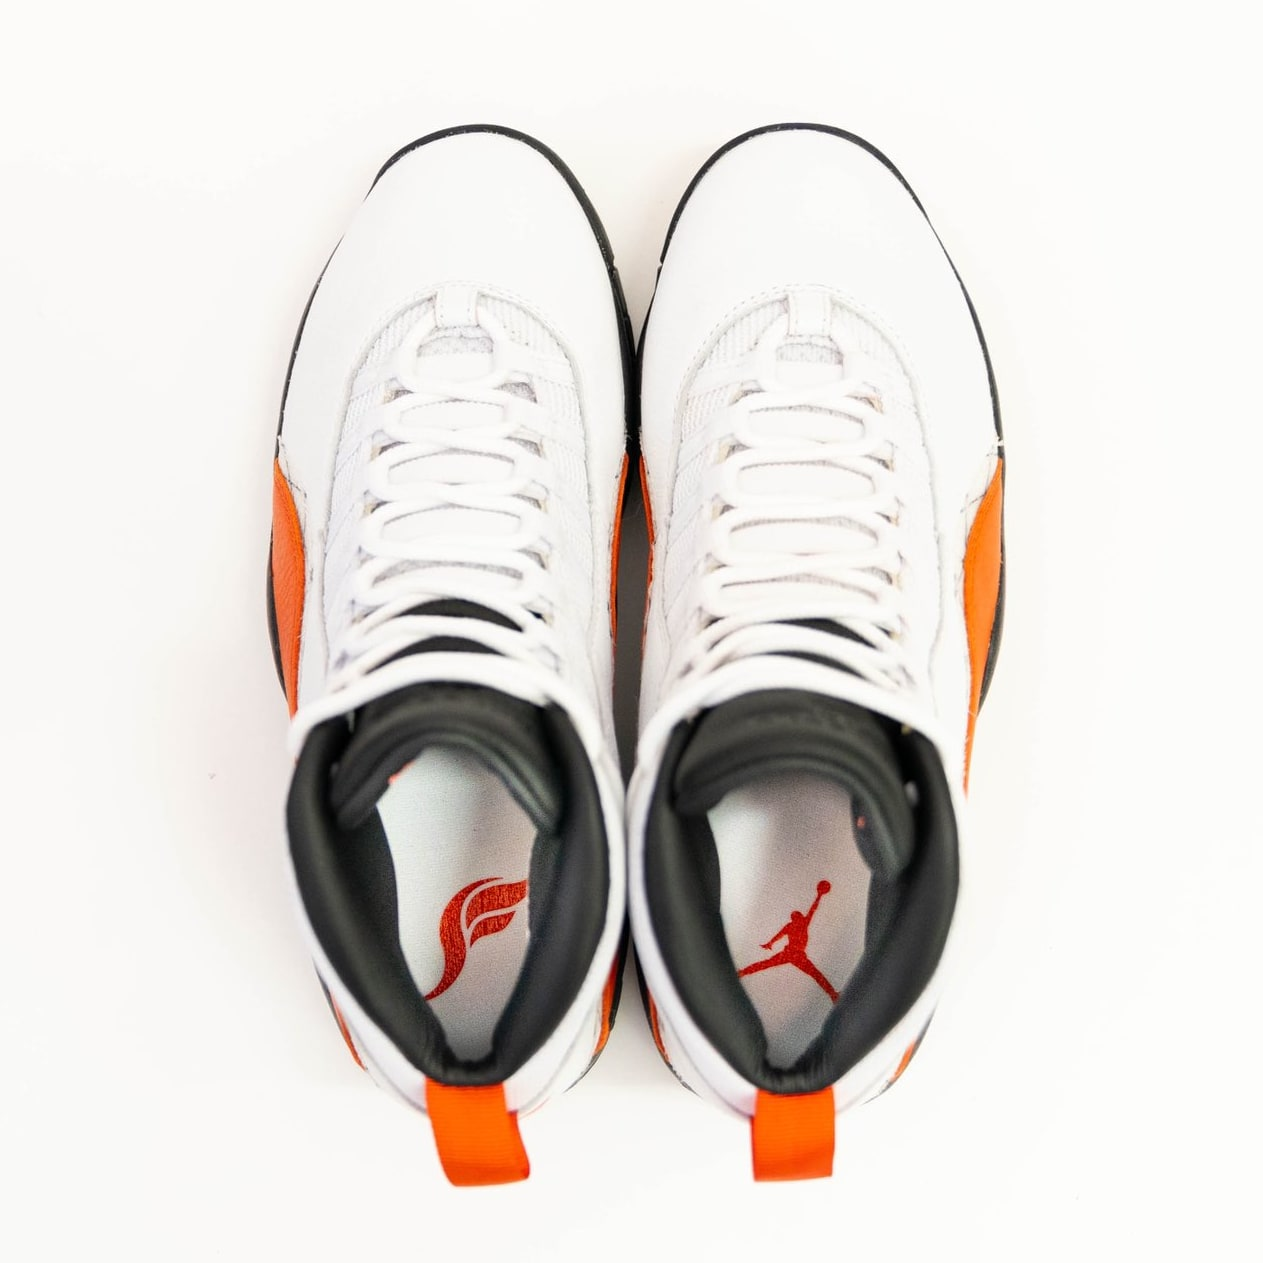 SoleFly x Air Jordan 10 PE Release Date Top